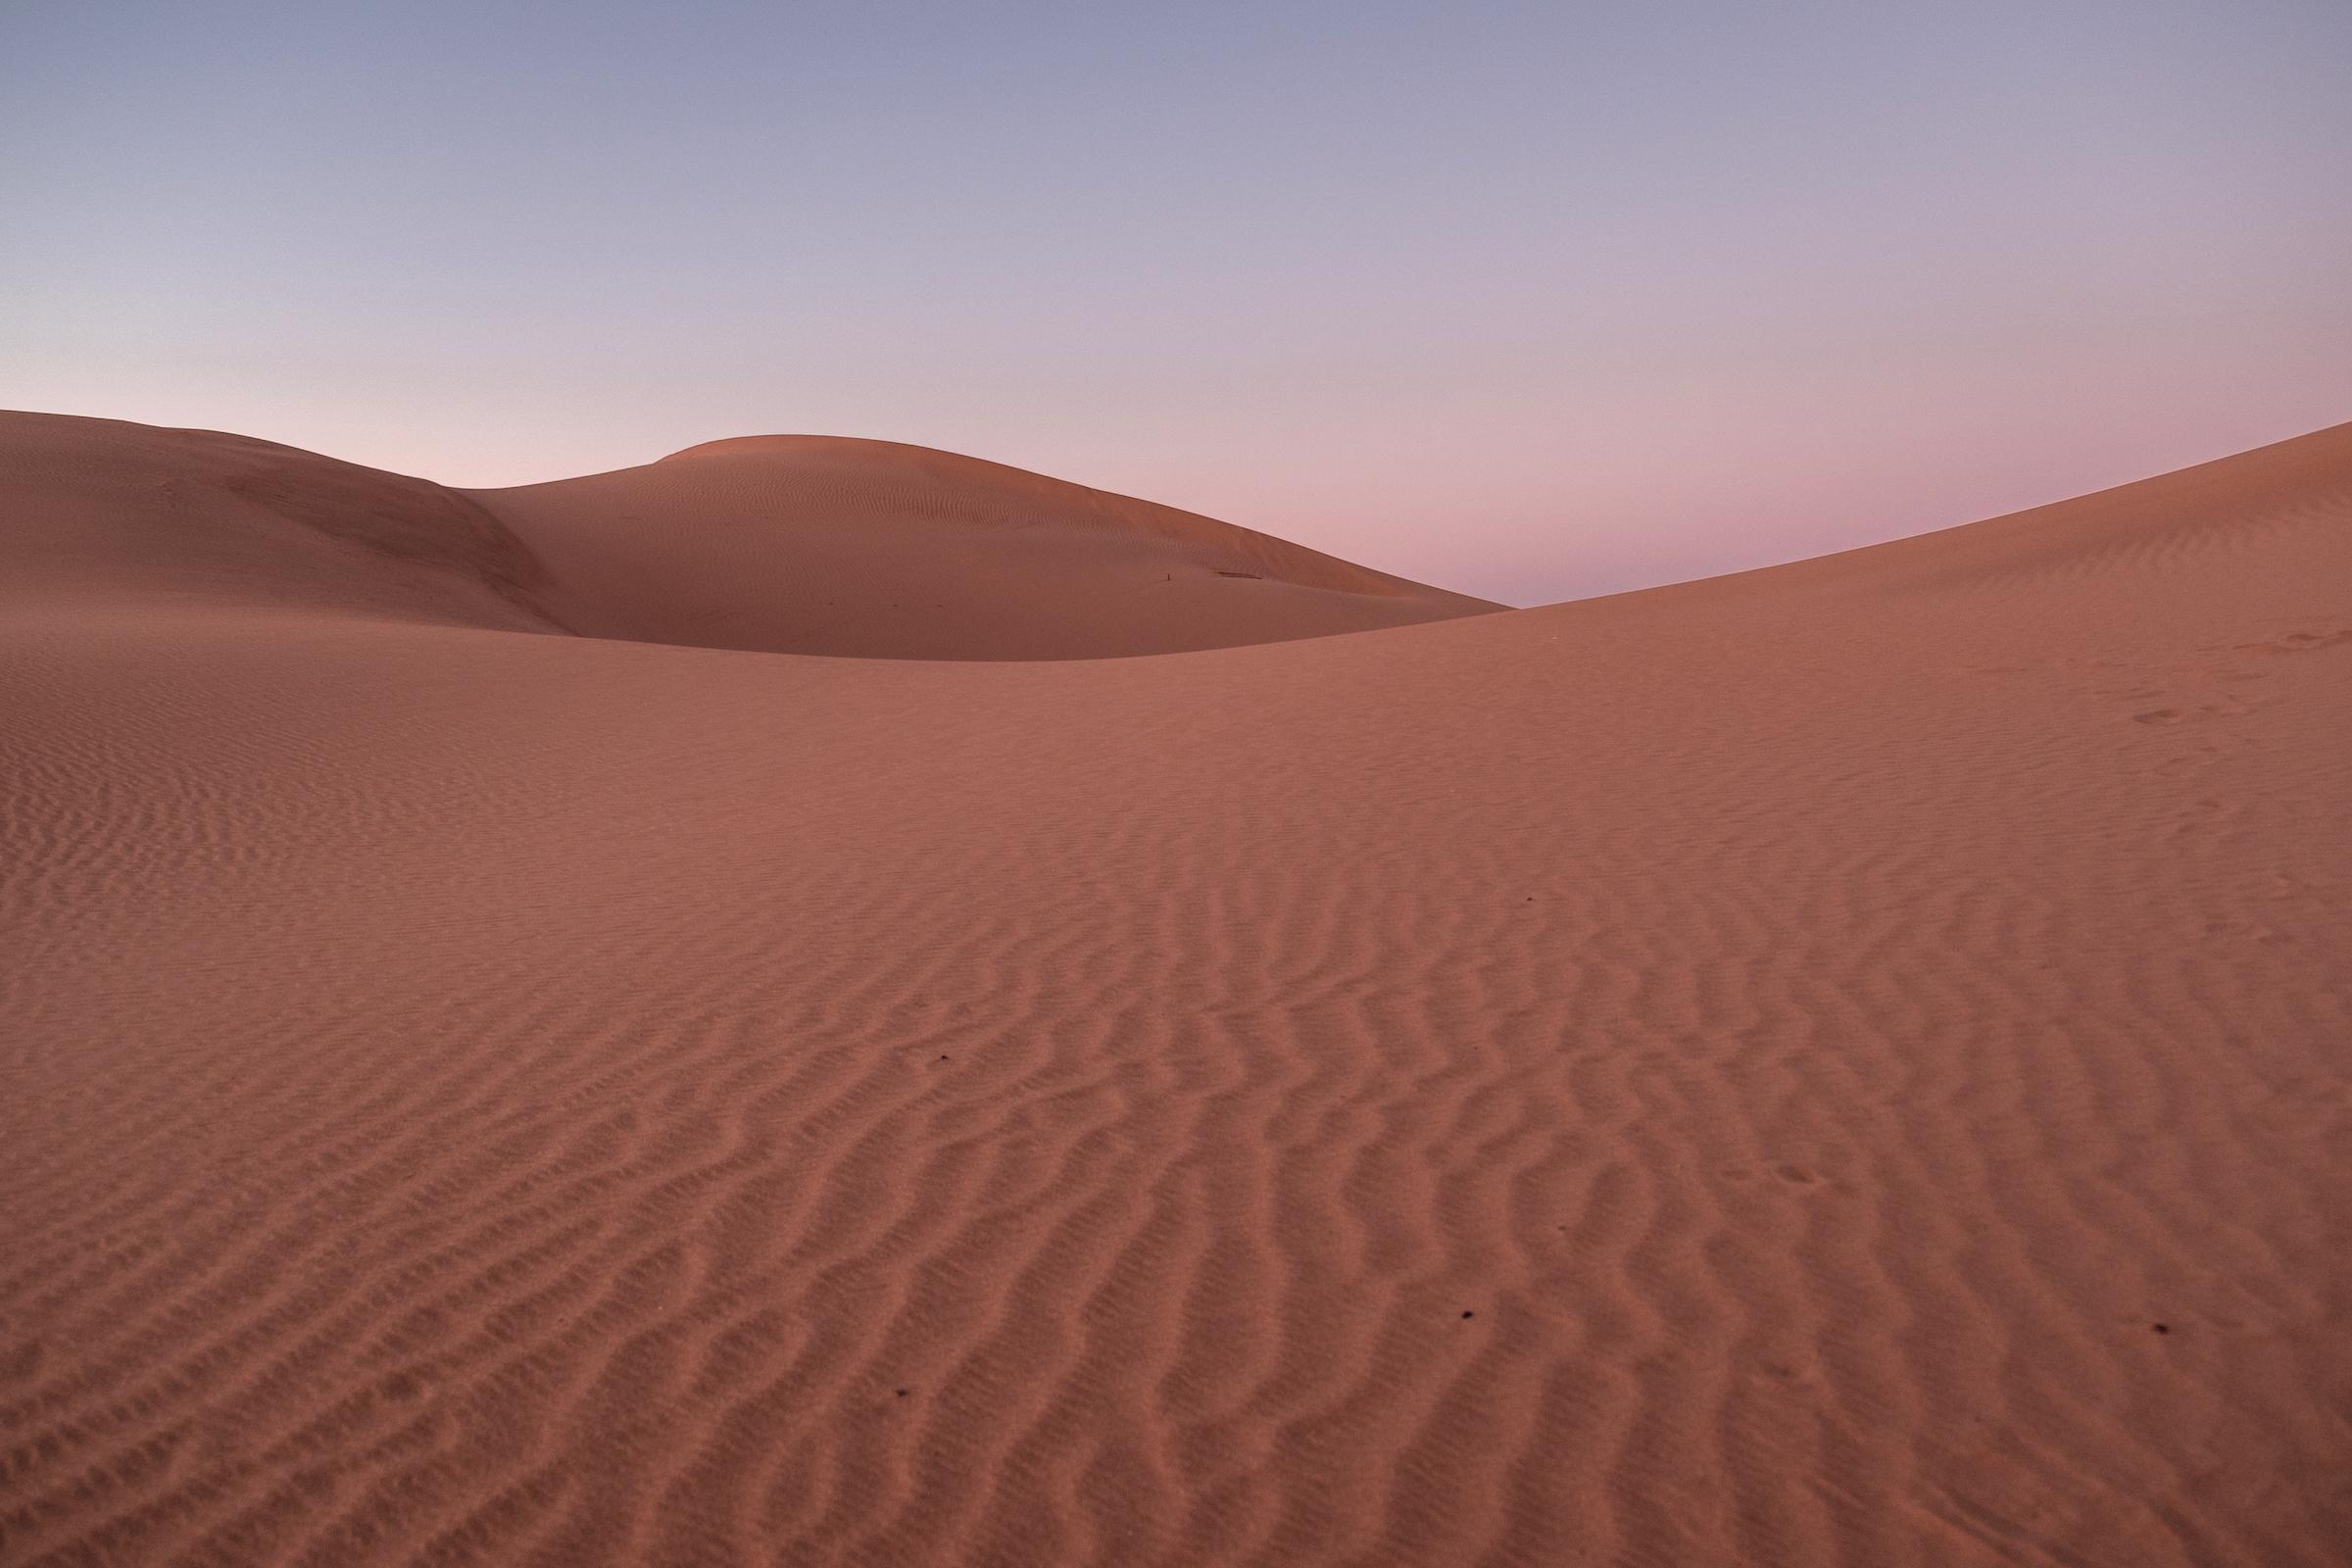 Morning Light on the Dunes